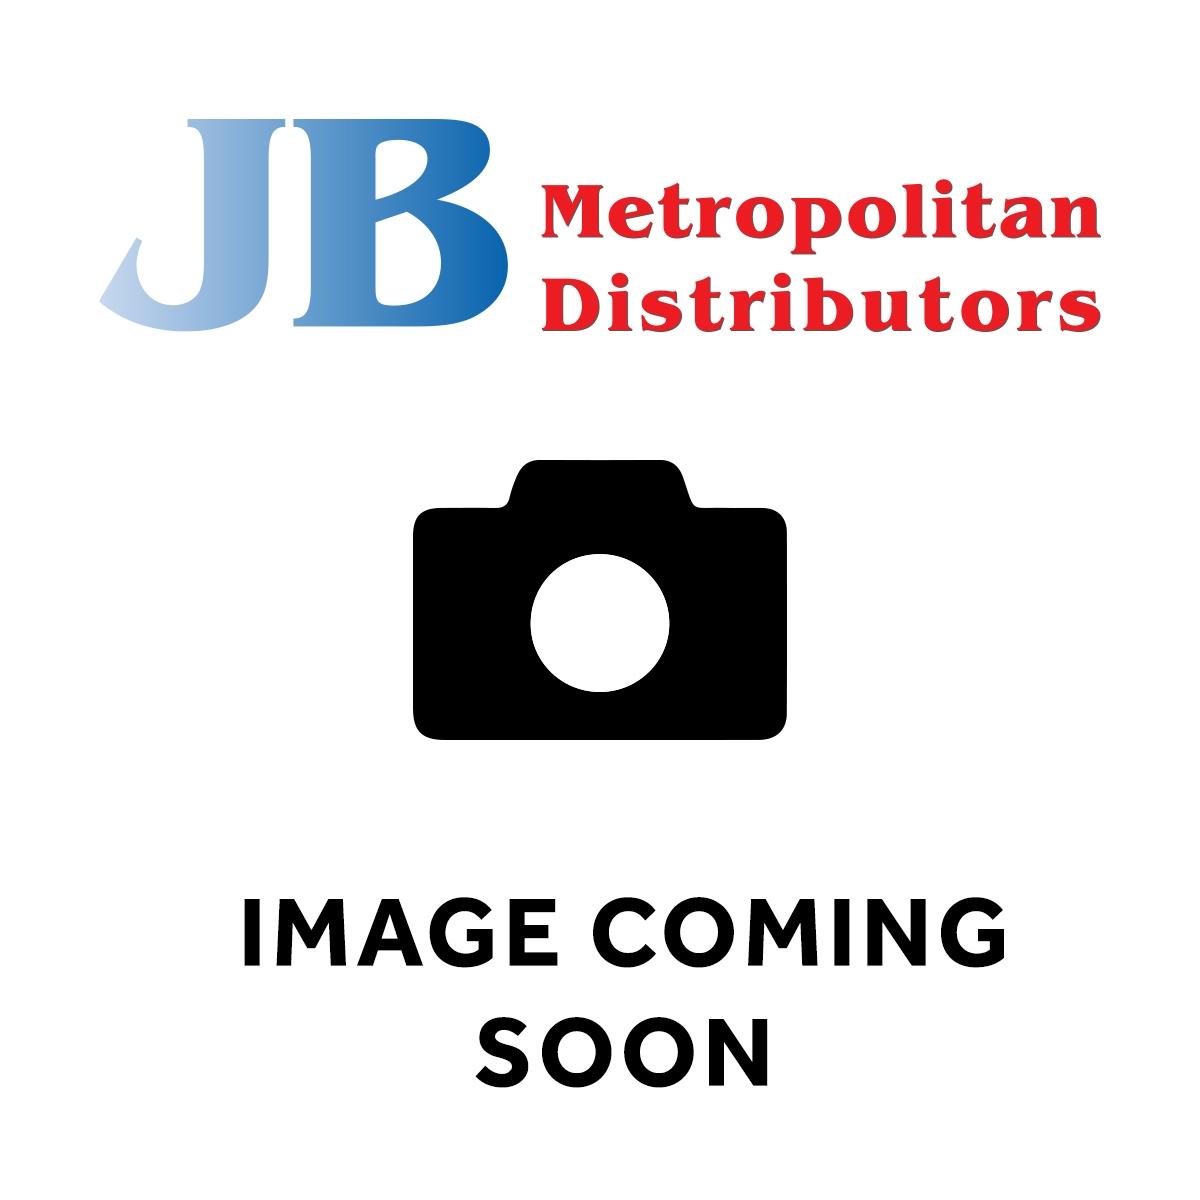 73G KRAFT EASY MAC BOWL CHEESE